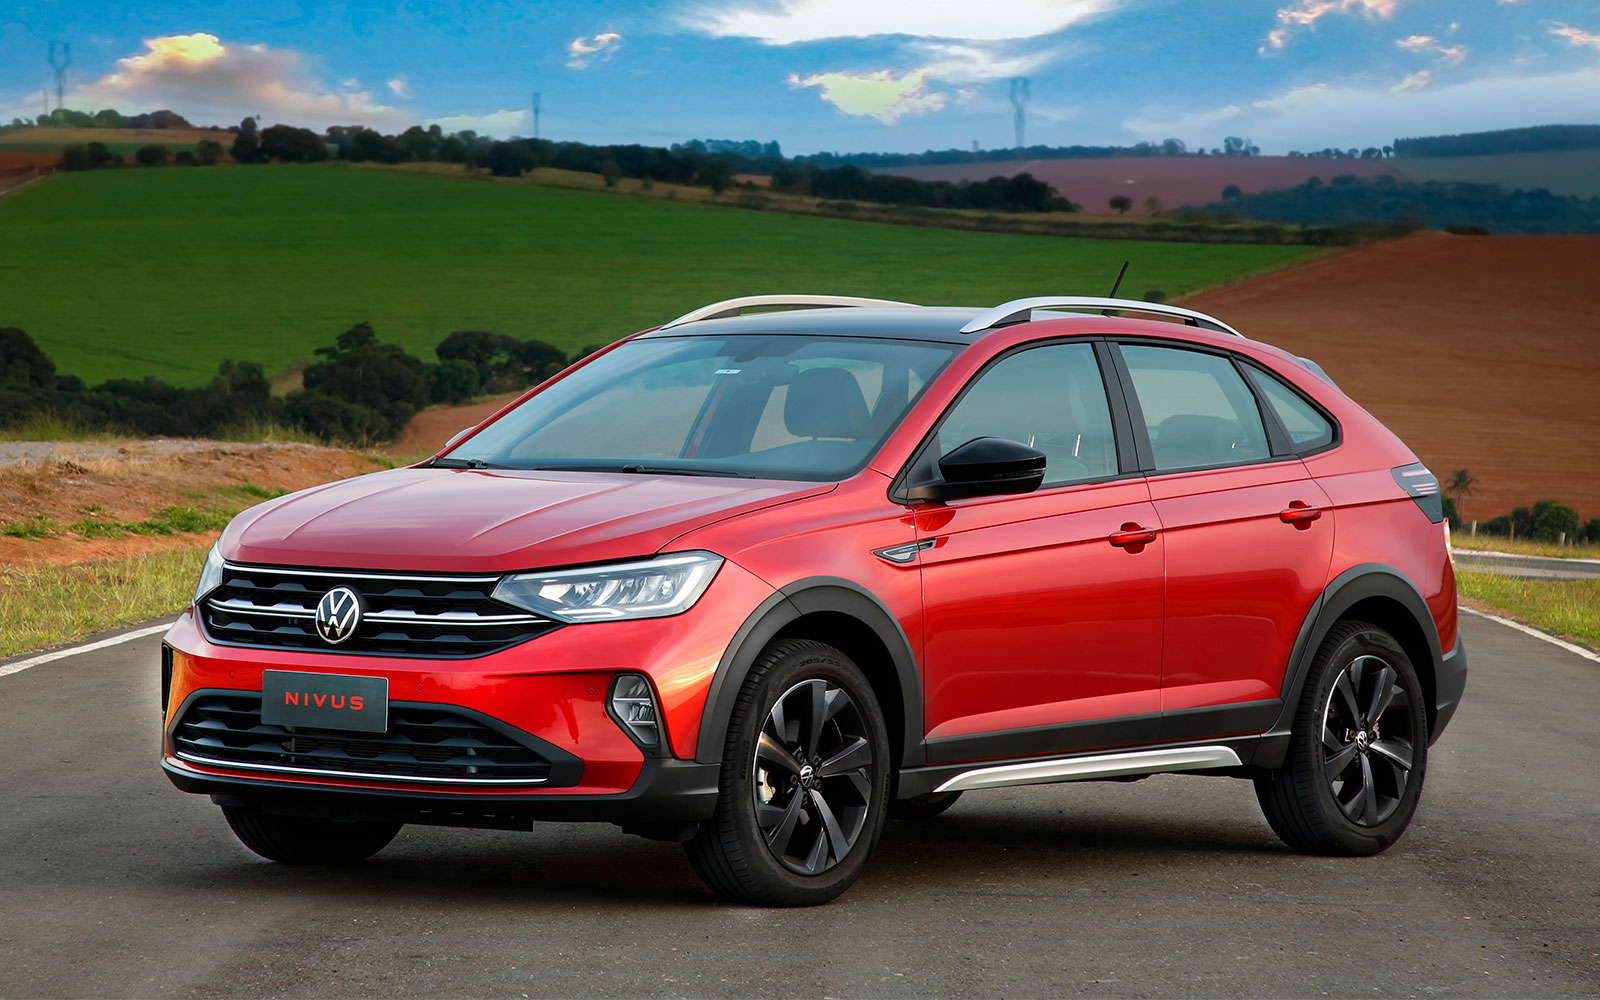 Volkswagen Nivus выйдет на европейский рынок 1